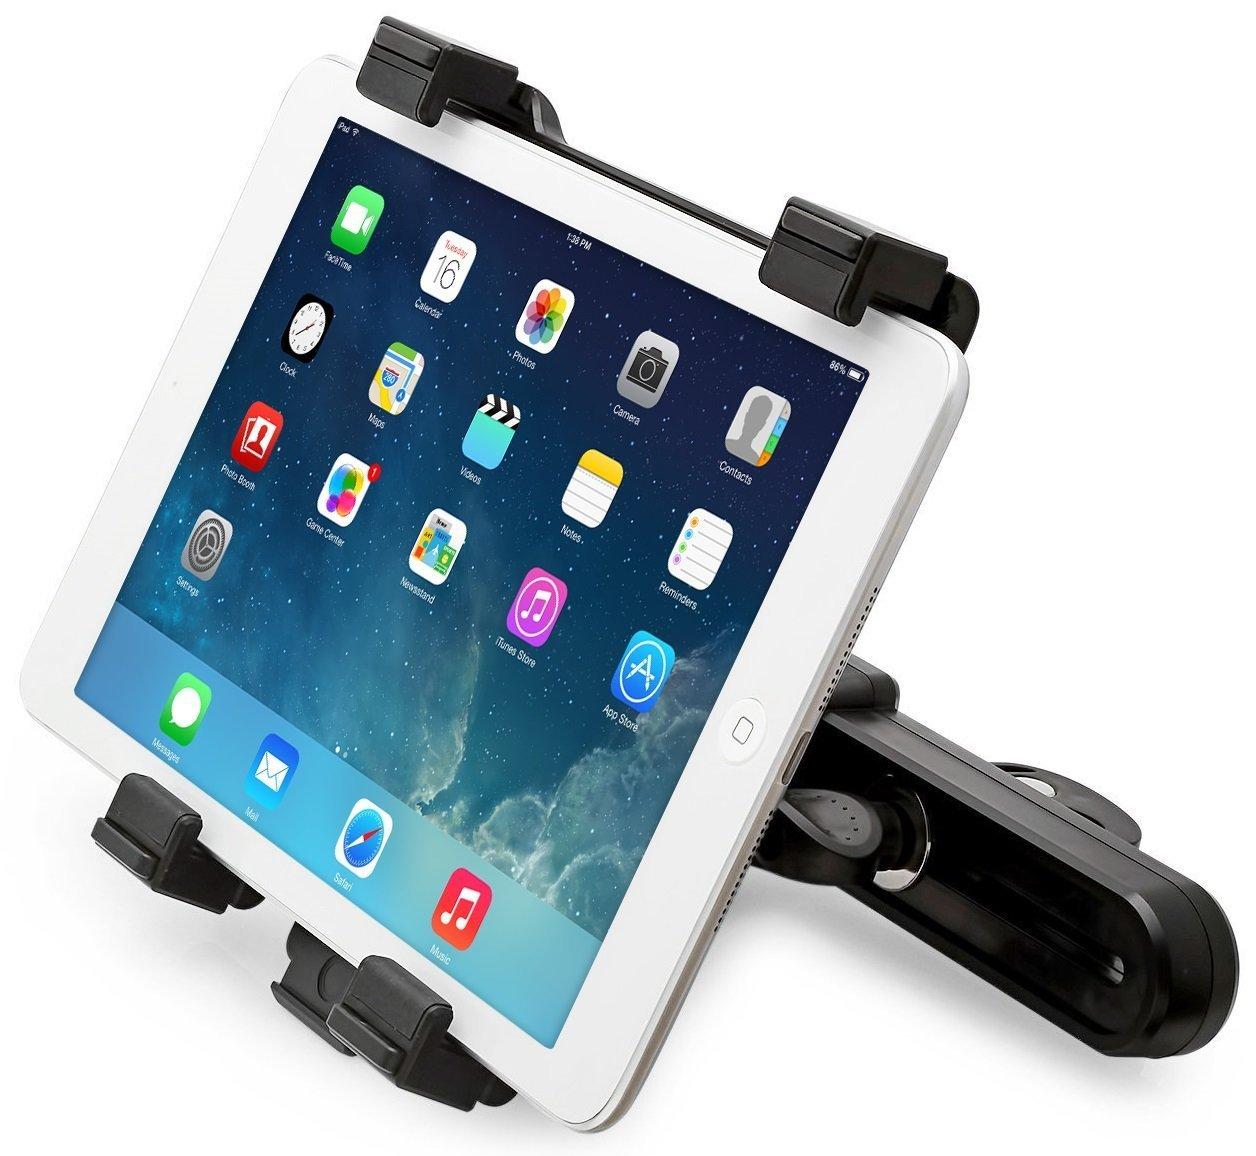 Universal Car Headrest Mount Holder for iPad, iPad Air, iPad Mini, Samsung Galaxy Tab, Kindle fire HDX and 7-10 inch Tablets, 360 Degree Rotation by KonzTec CAK-CHMH01